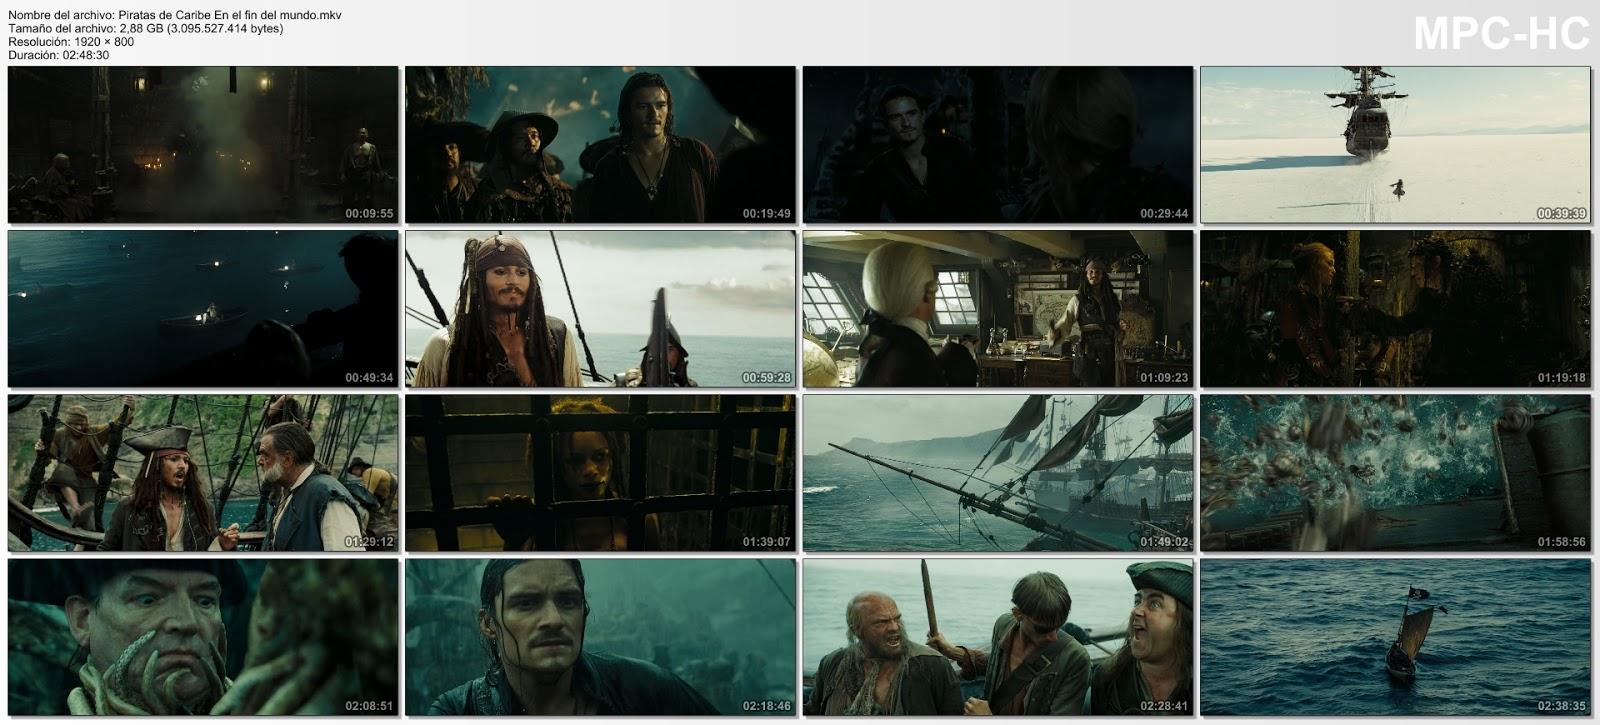 Piratas del Caribe 2 UHD 4K Latino captura 1